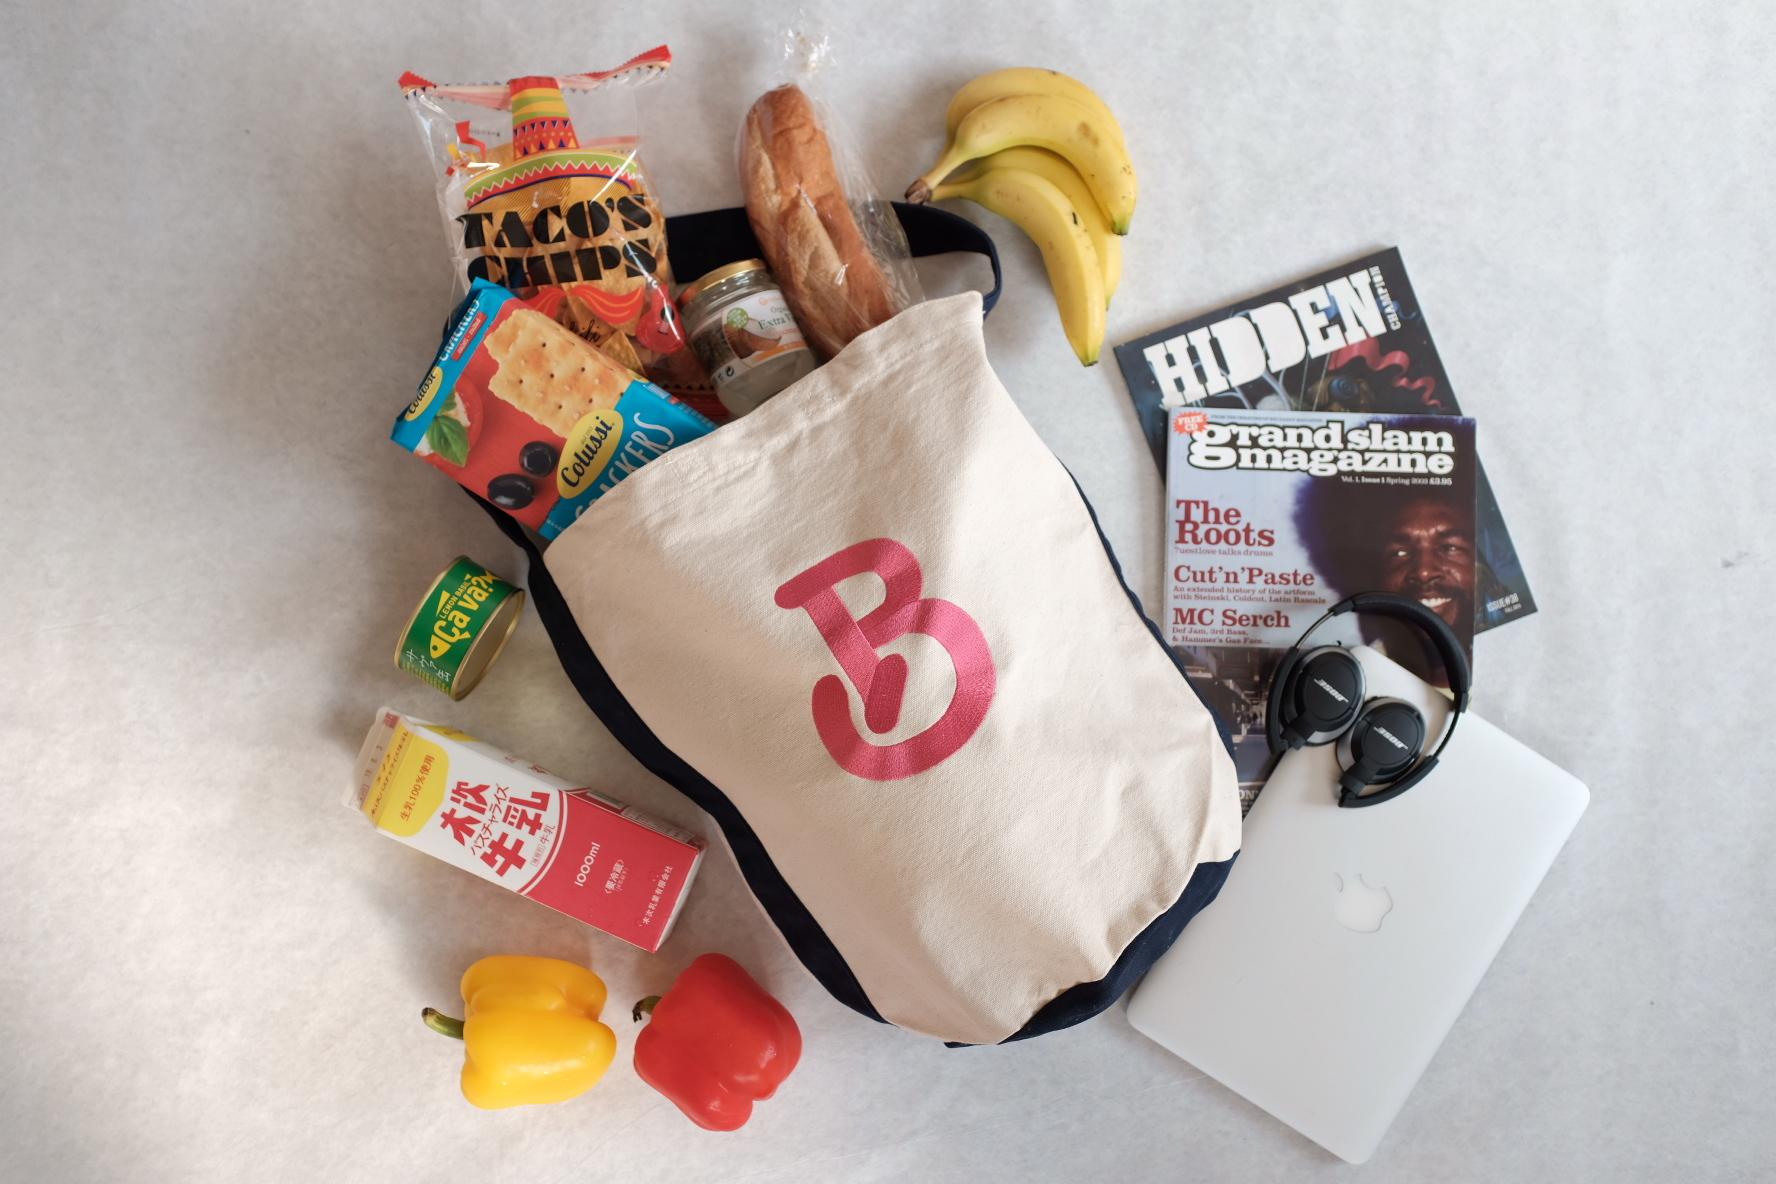 My tote bag[Navy strap]